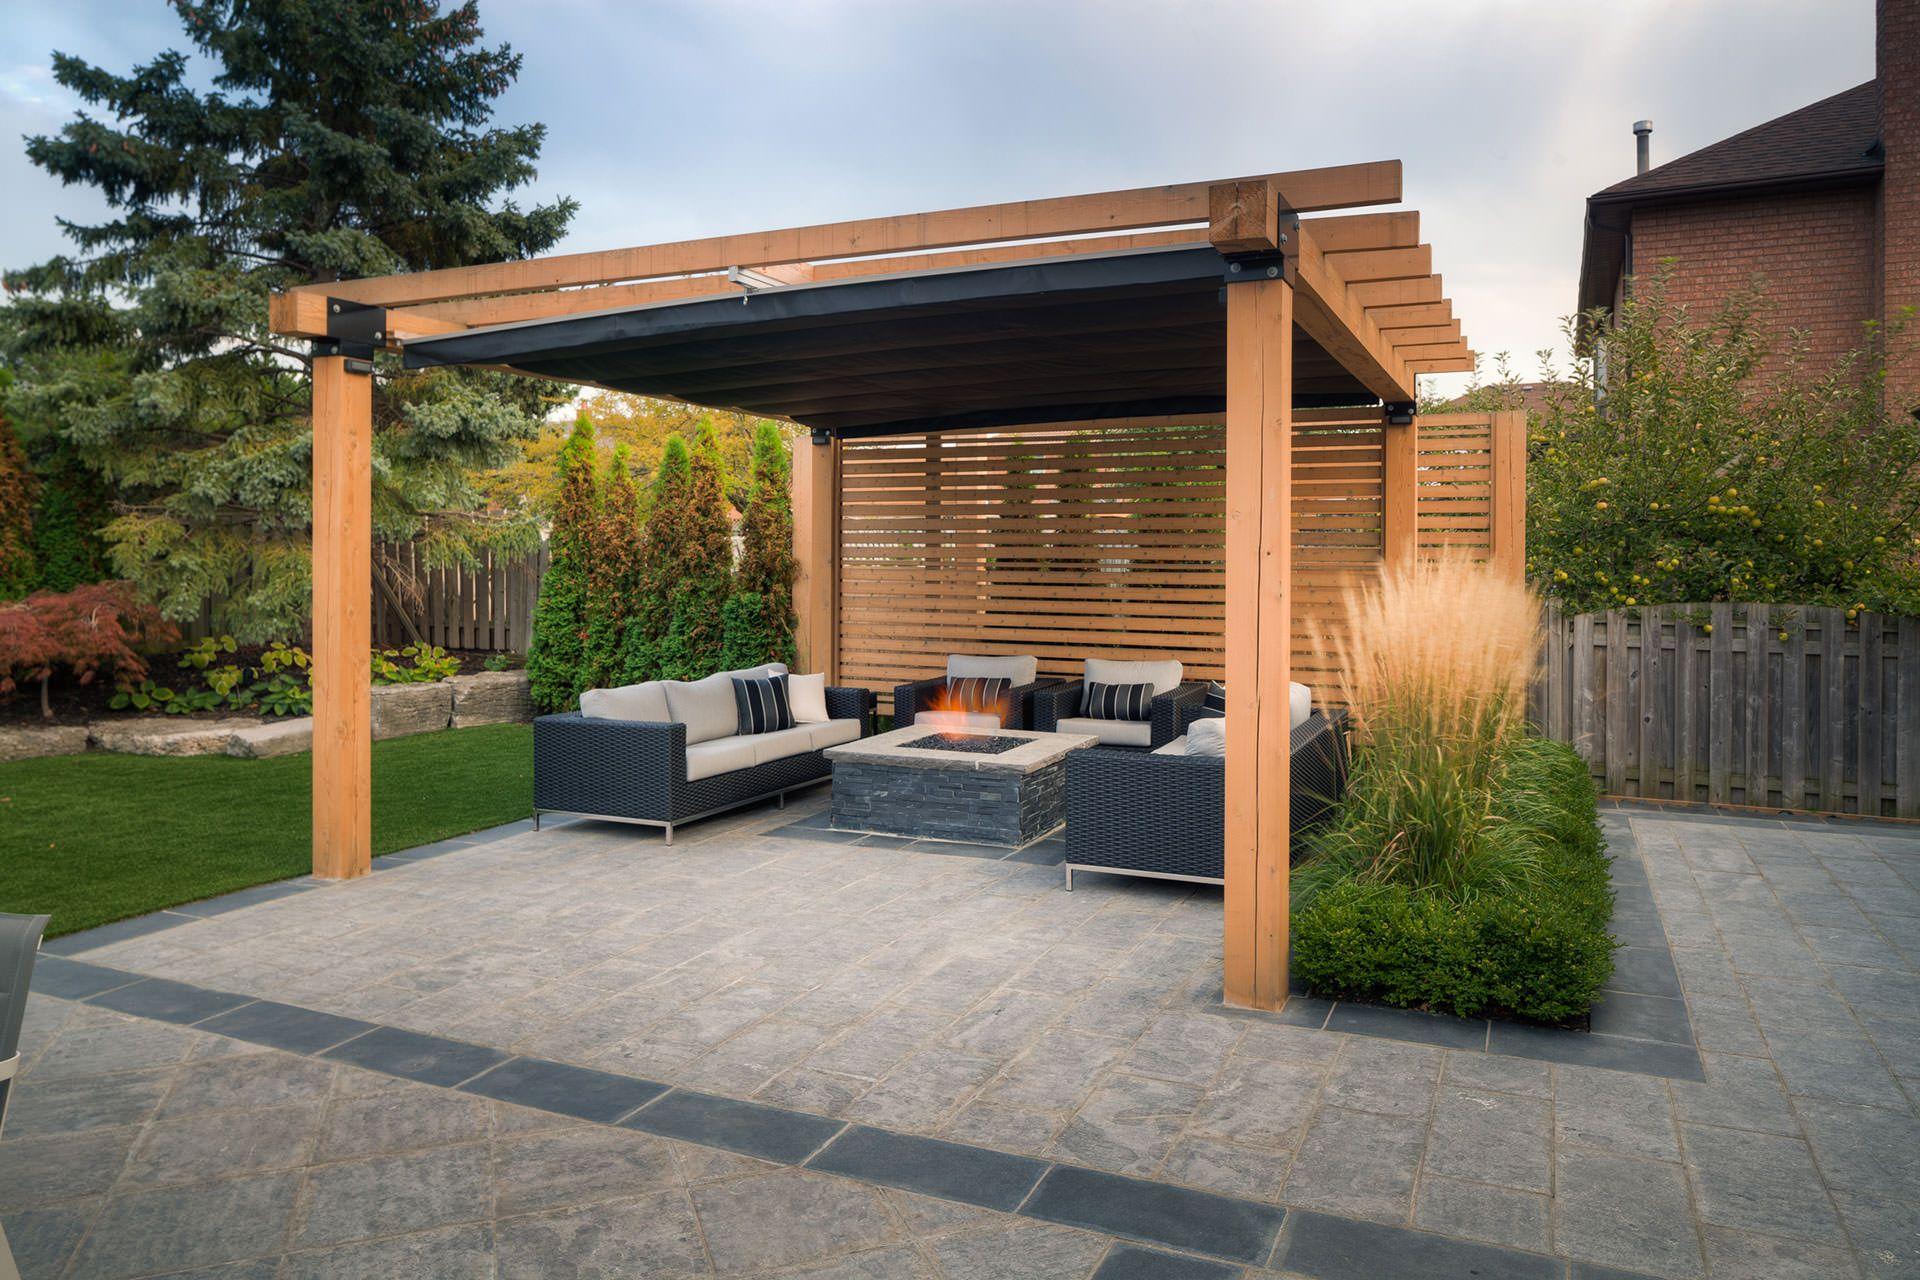 9 diy cool creative patio flooring ideas backyard